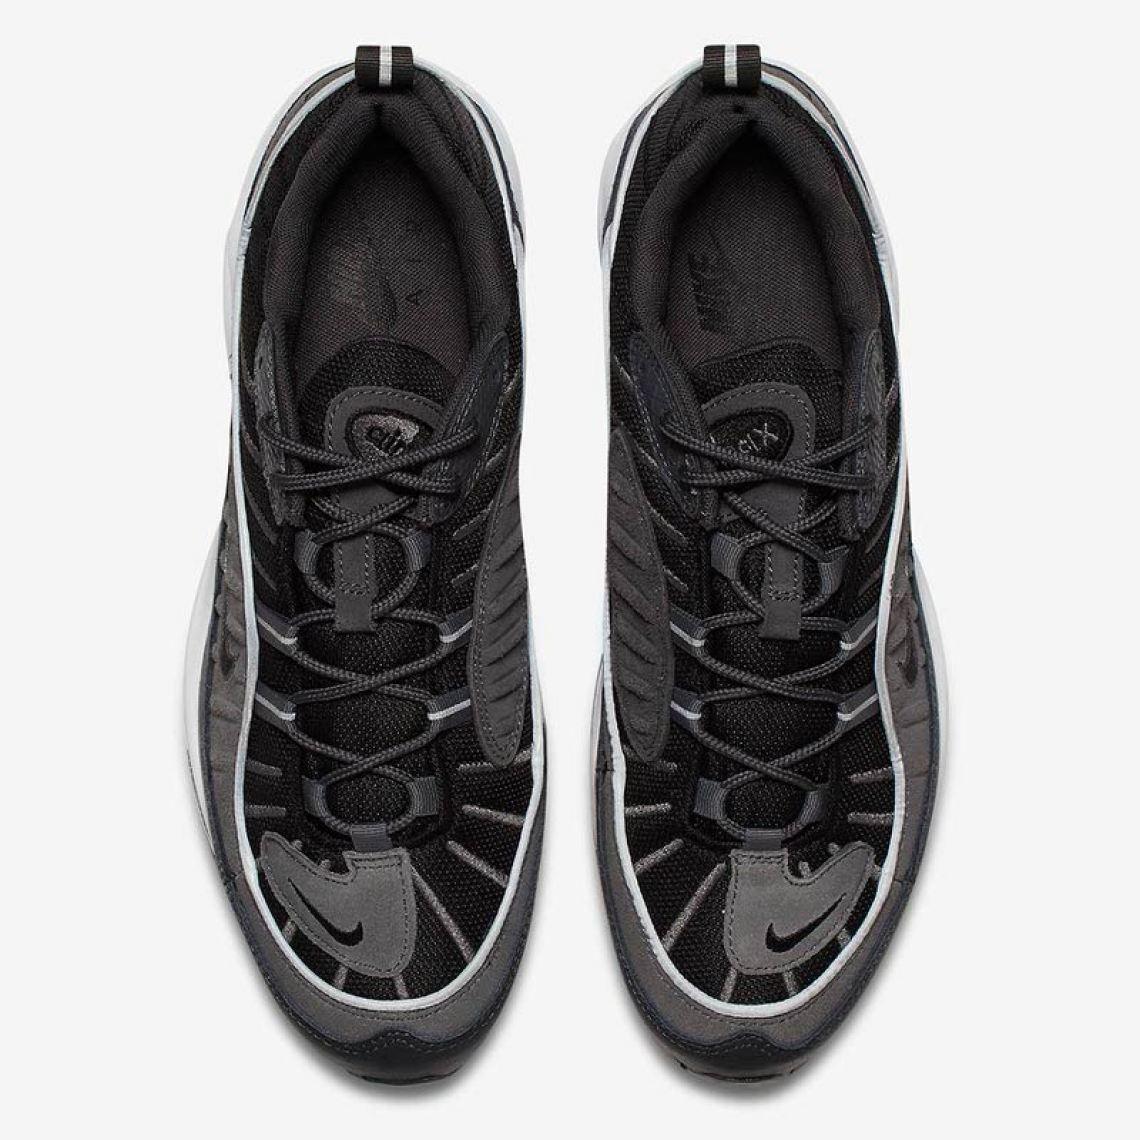 Nike Air Max 98 Black/Anthracite